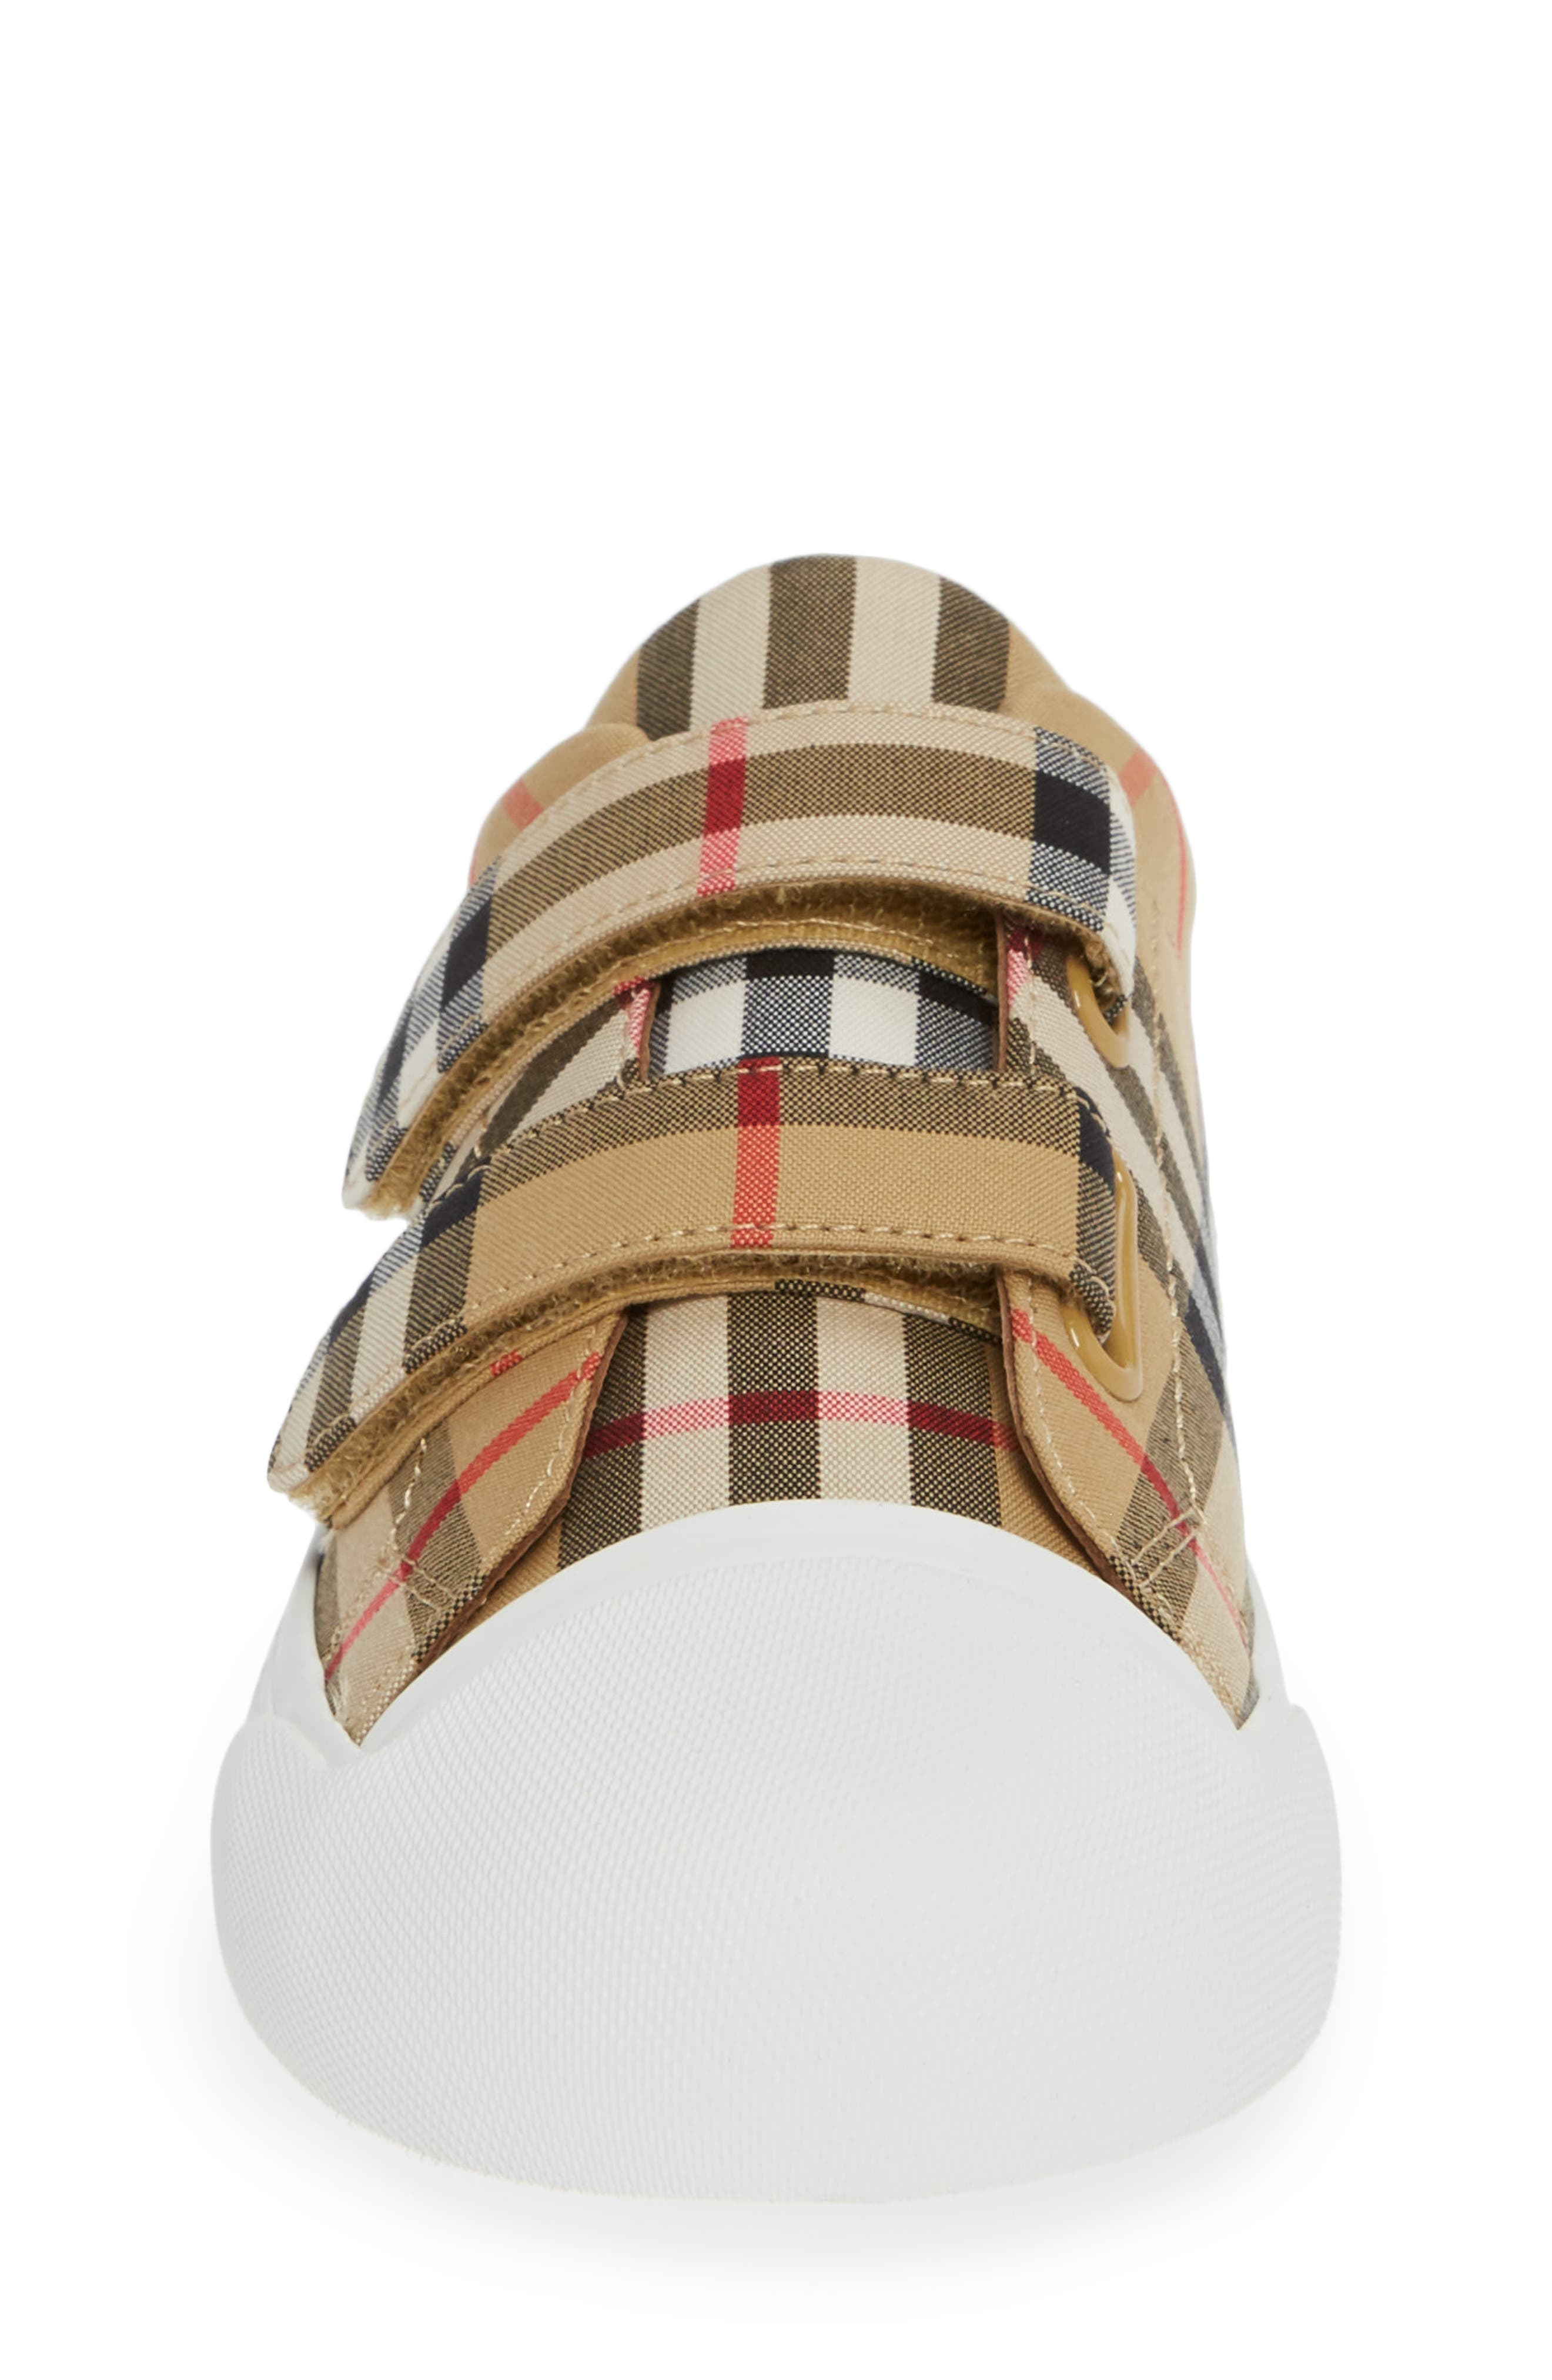 BURBERRY, Belside Sneaker, Alternate thumbnail 4, color, ANTIQUE YELLOW-OPTIC WHITE